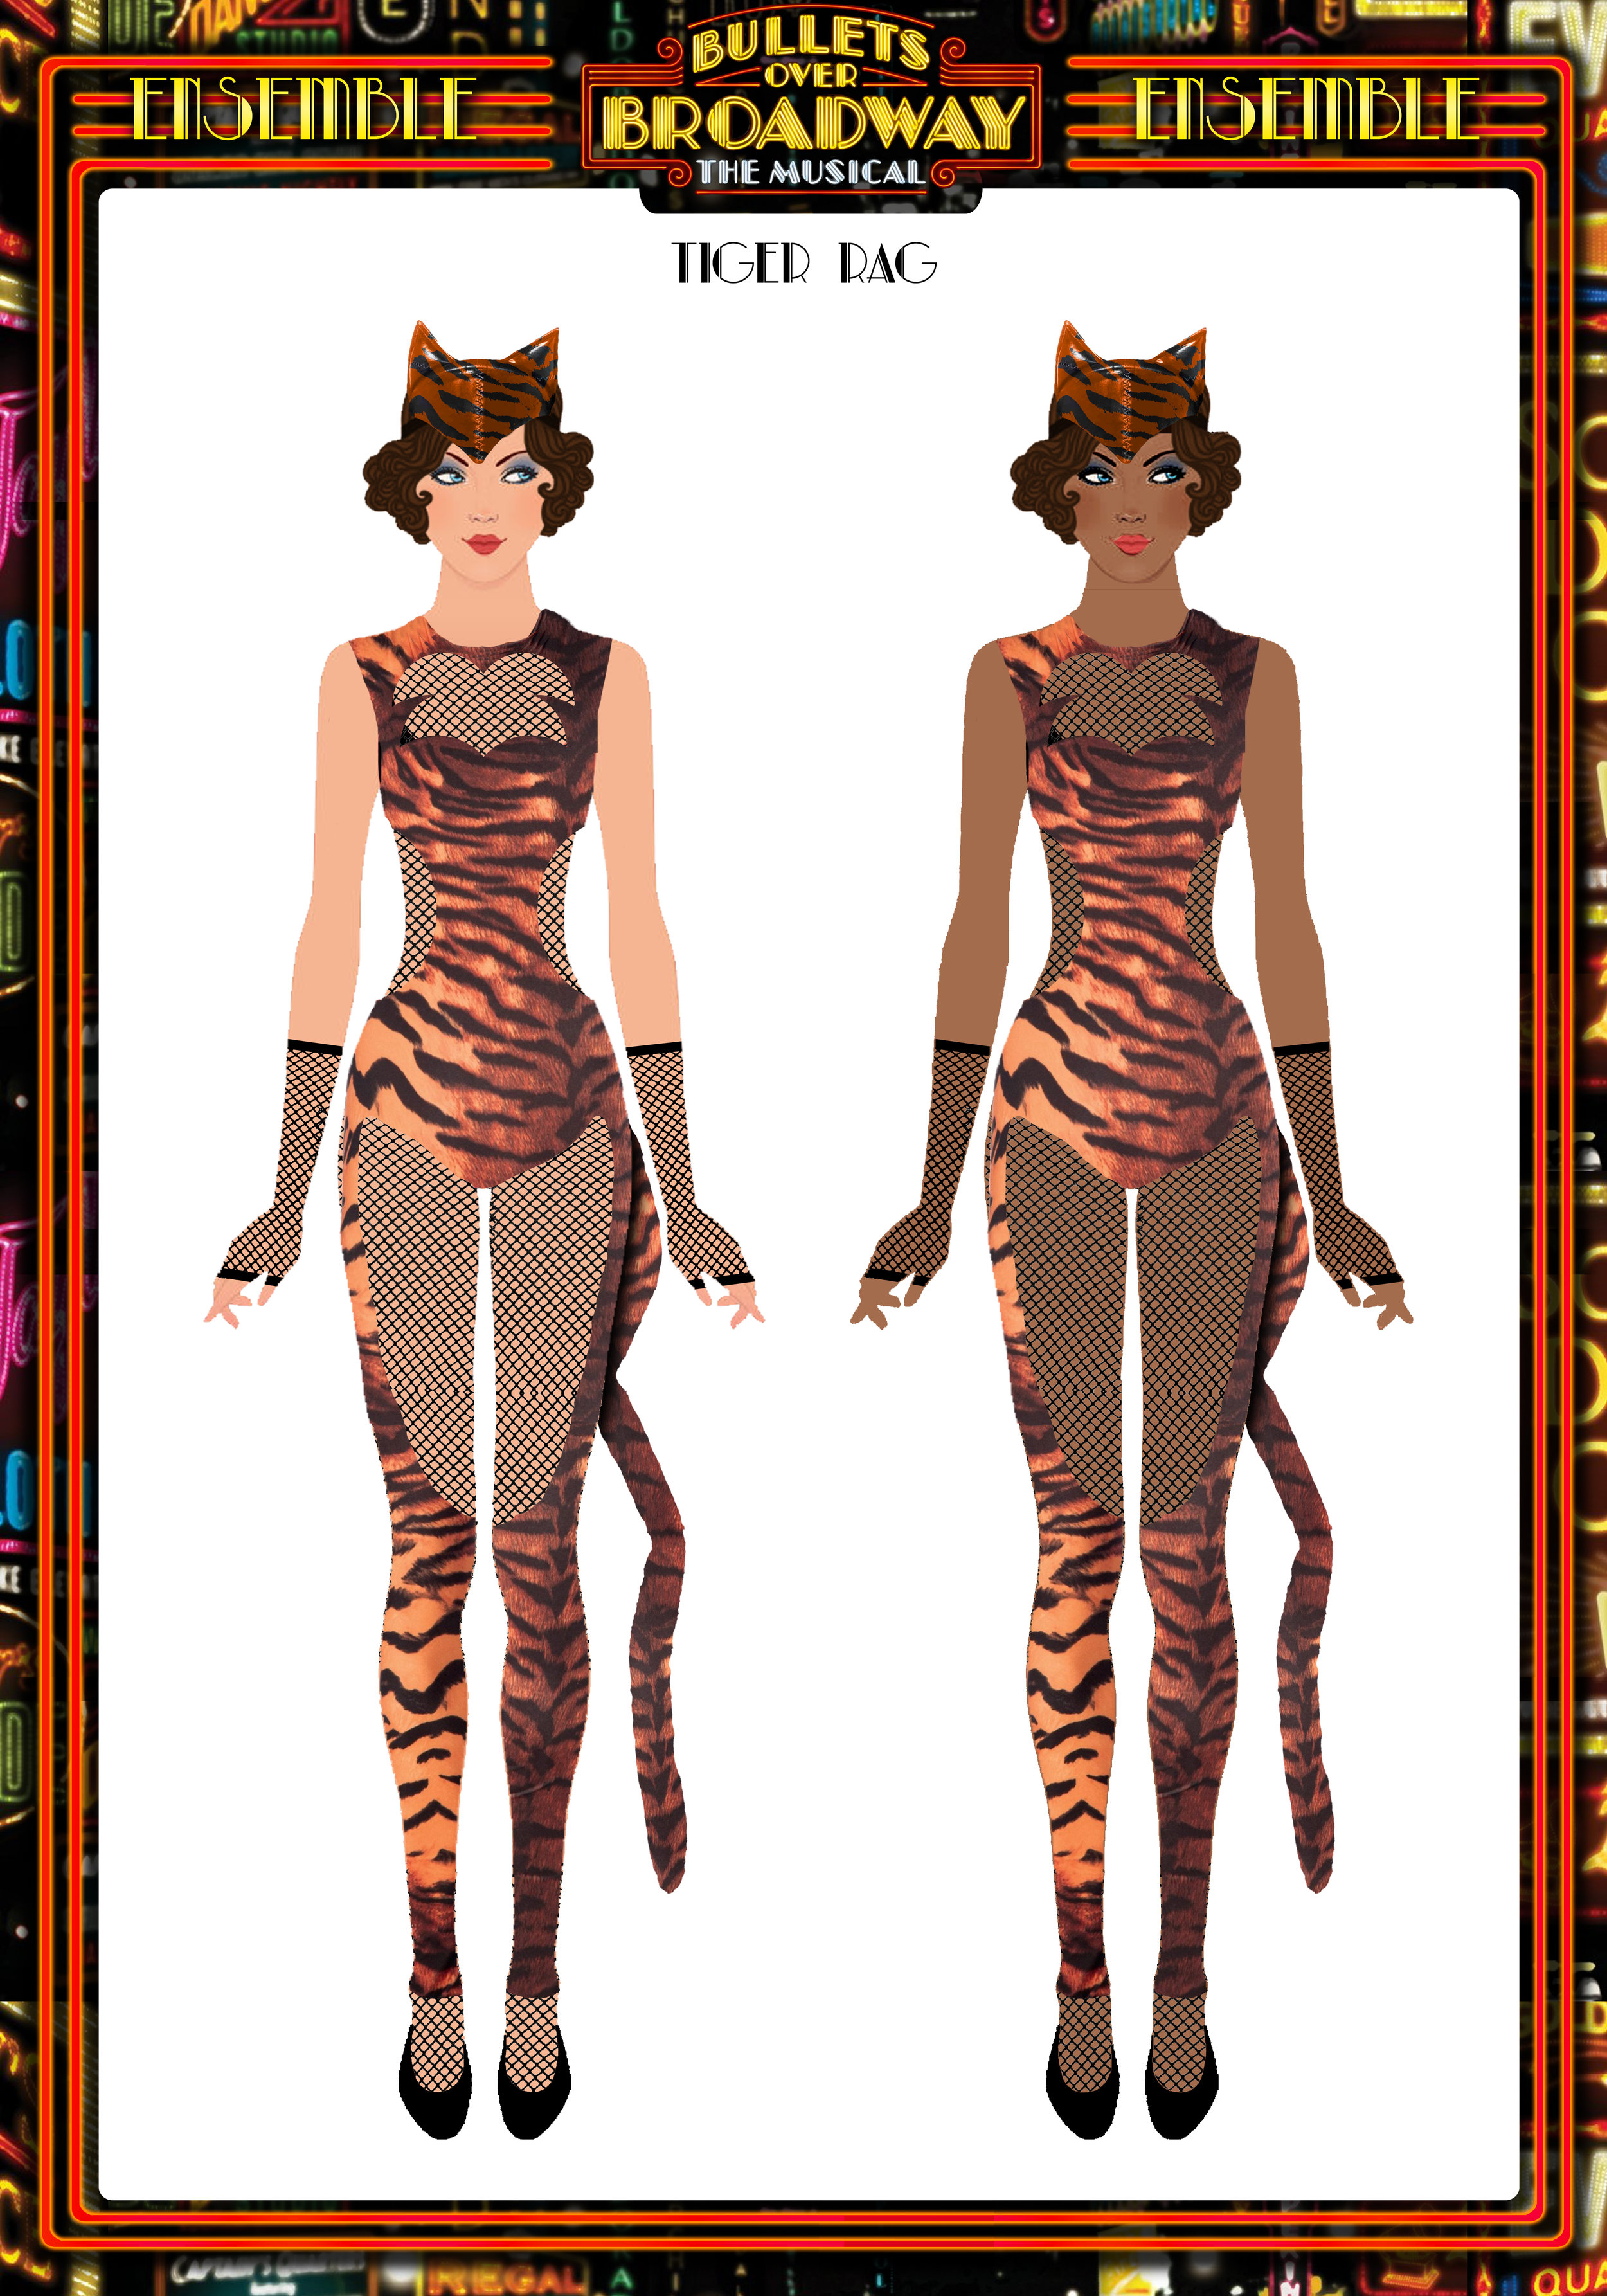 Tiger Rag.jpg